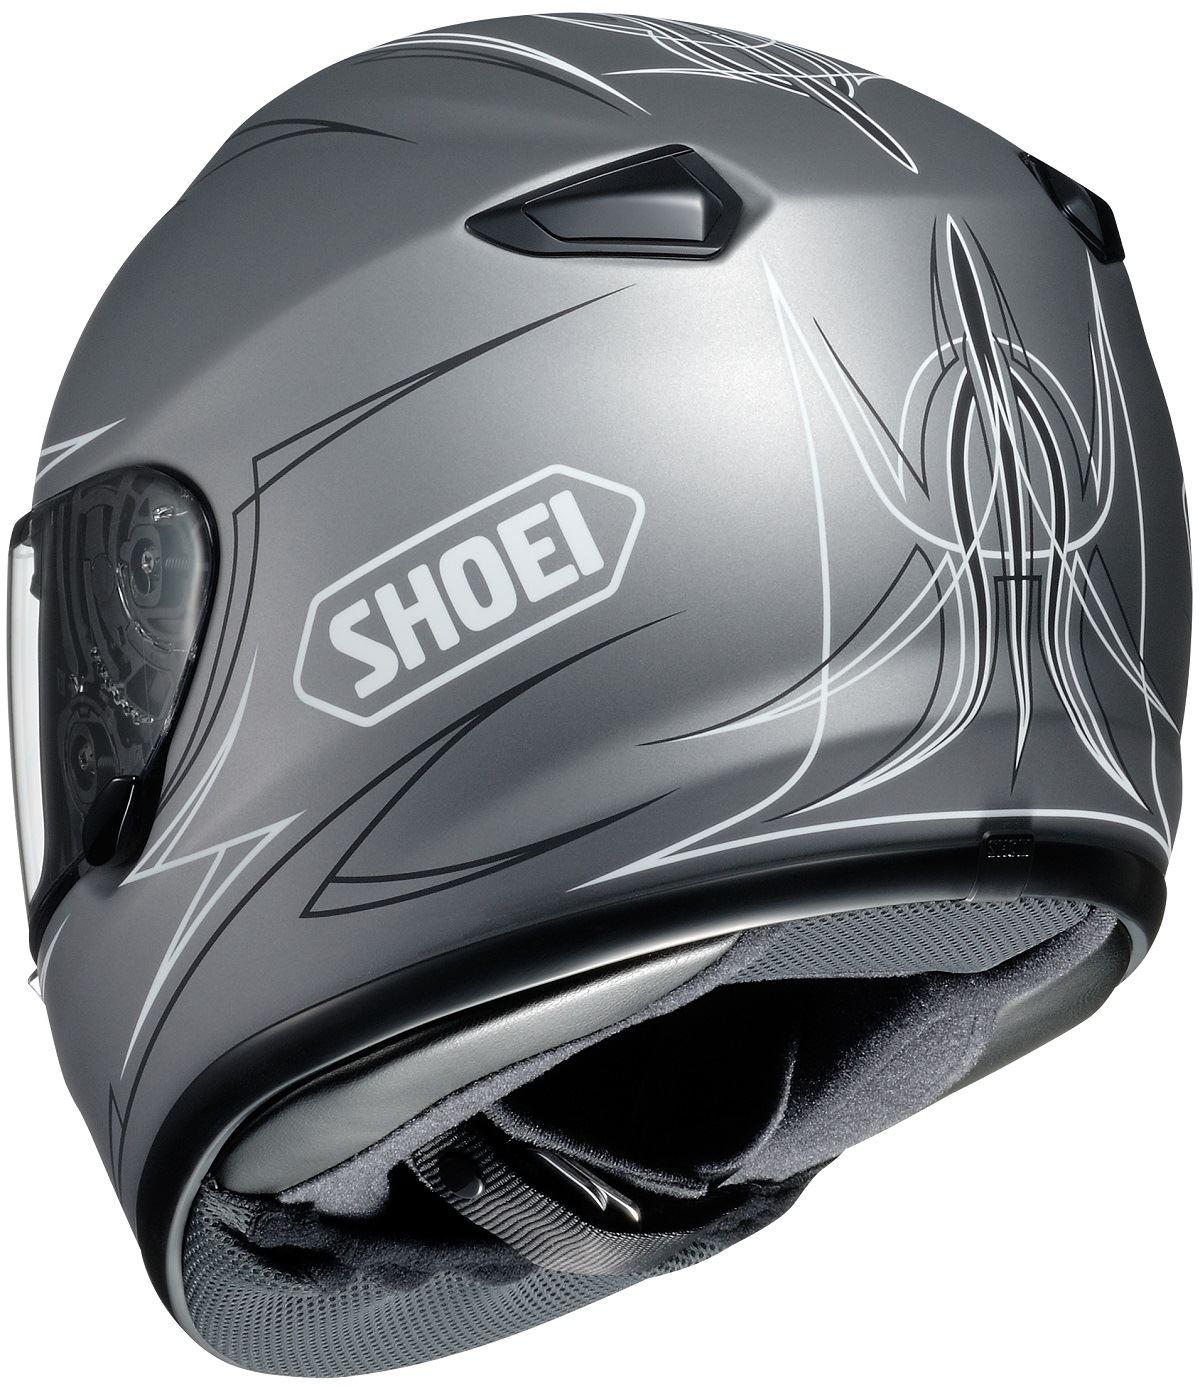 Shoei Qwest Full Face Motorcycle Helmet Snell M2015 Dot